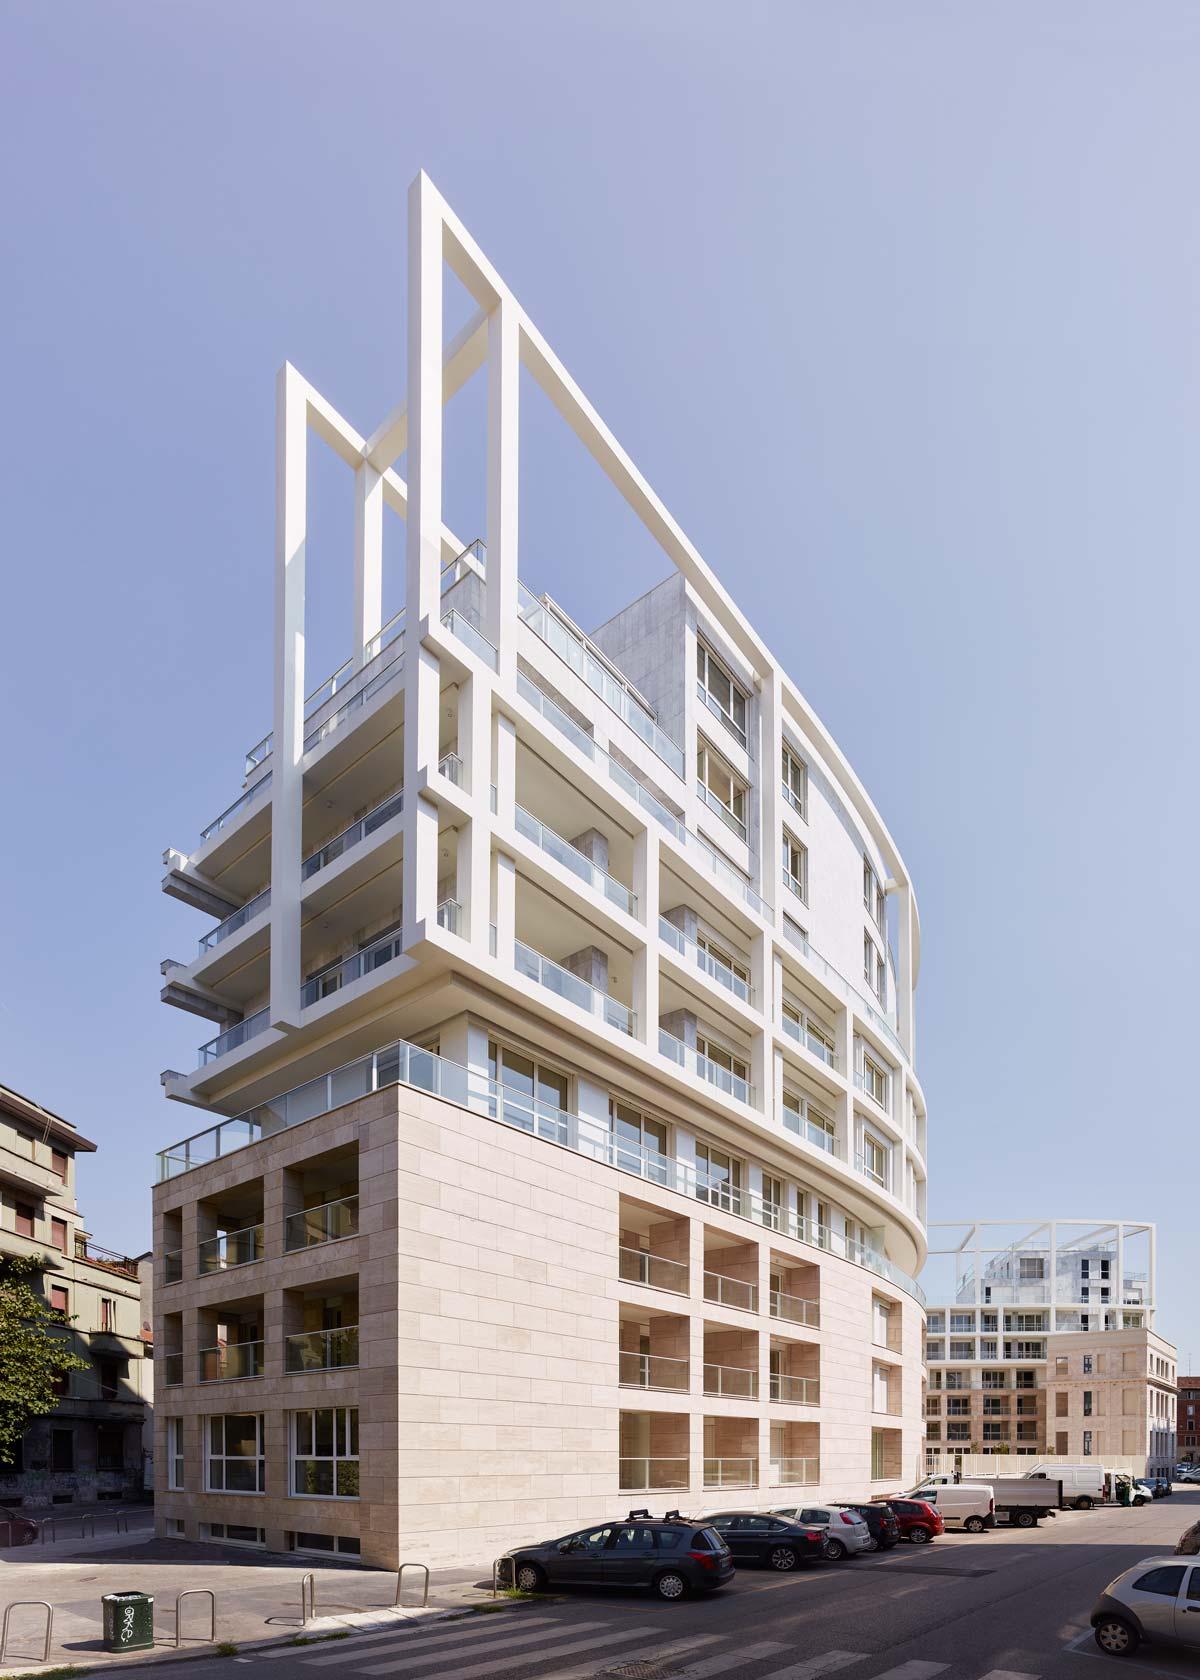 Degli-Esposti-Architetti-Milan-Residenze-Carlo-Erba-04